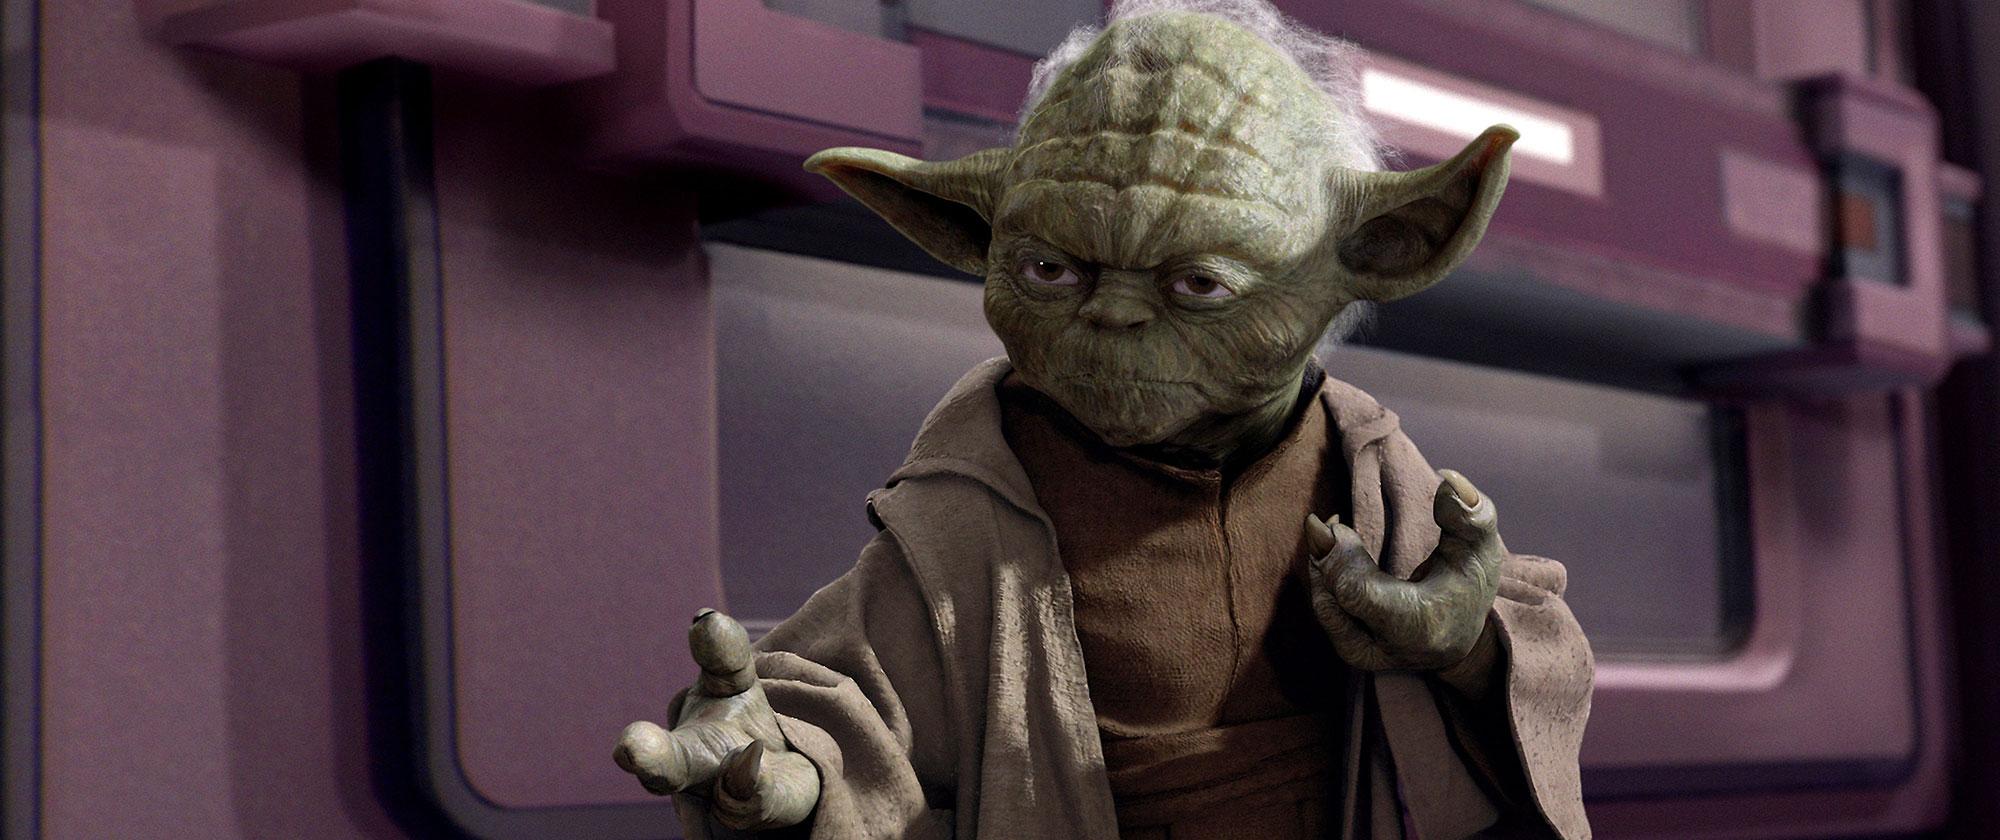 Noje_191206_Star-wars_Yoda